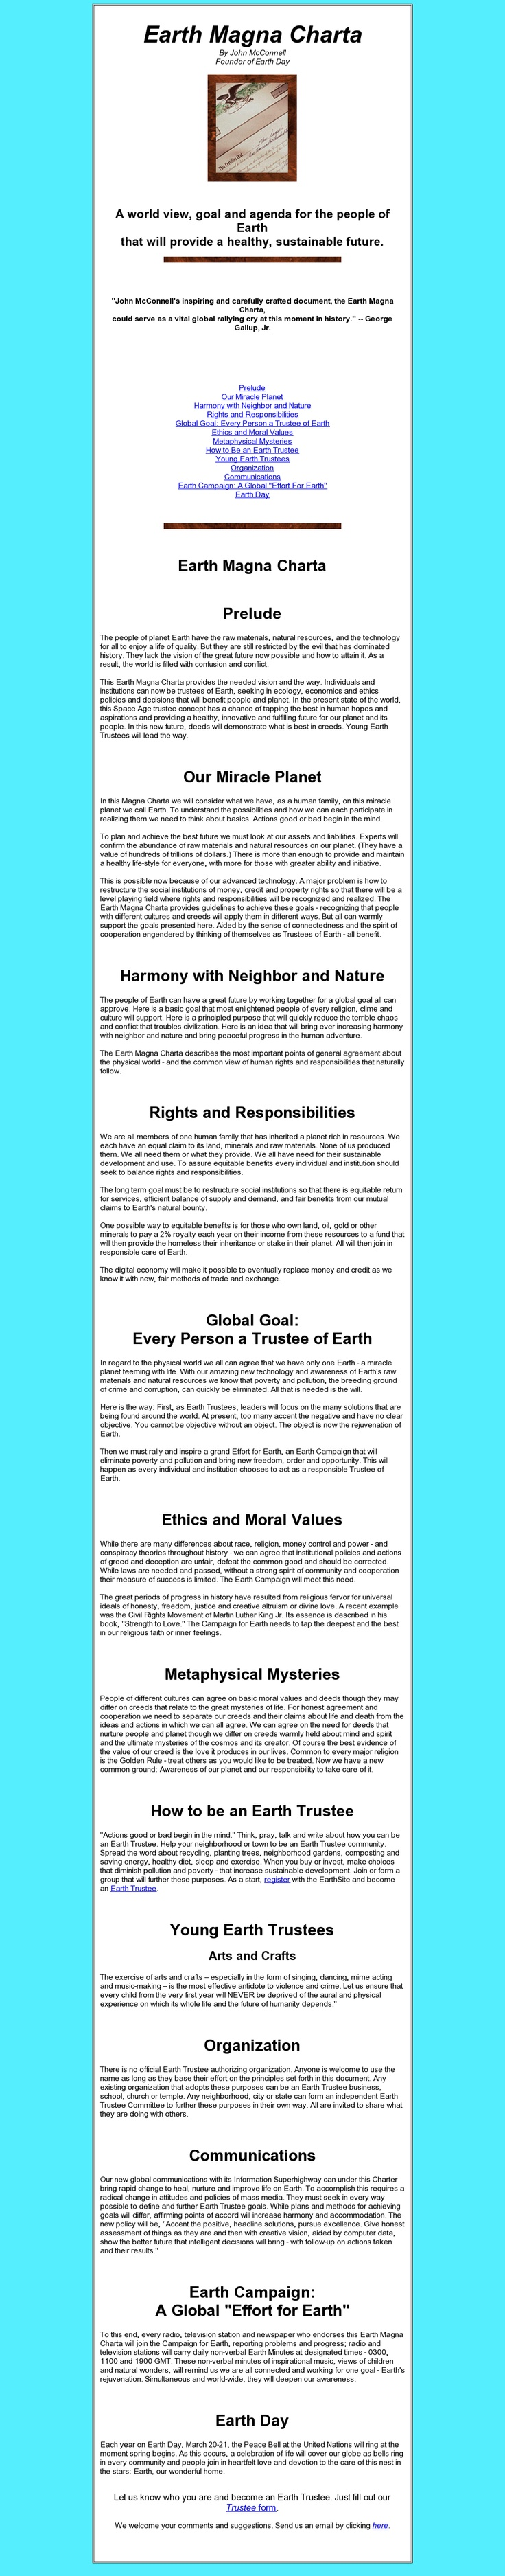 Earth Magna Charta